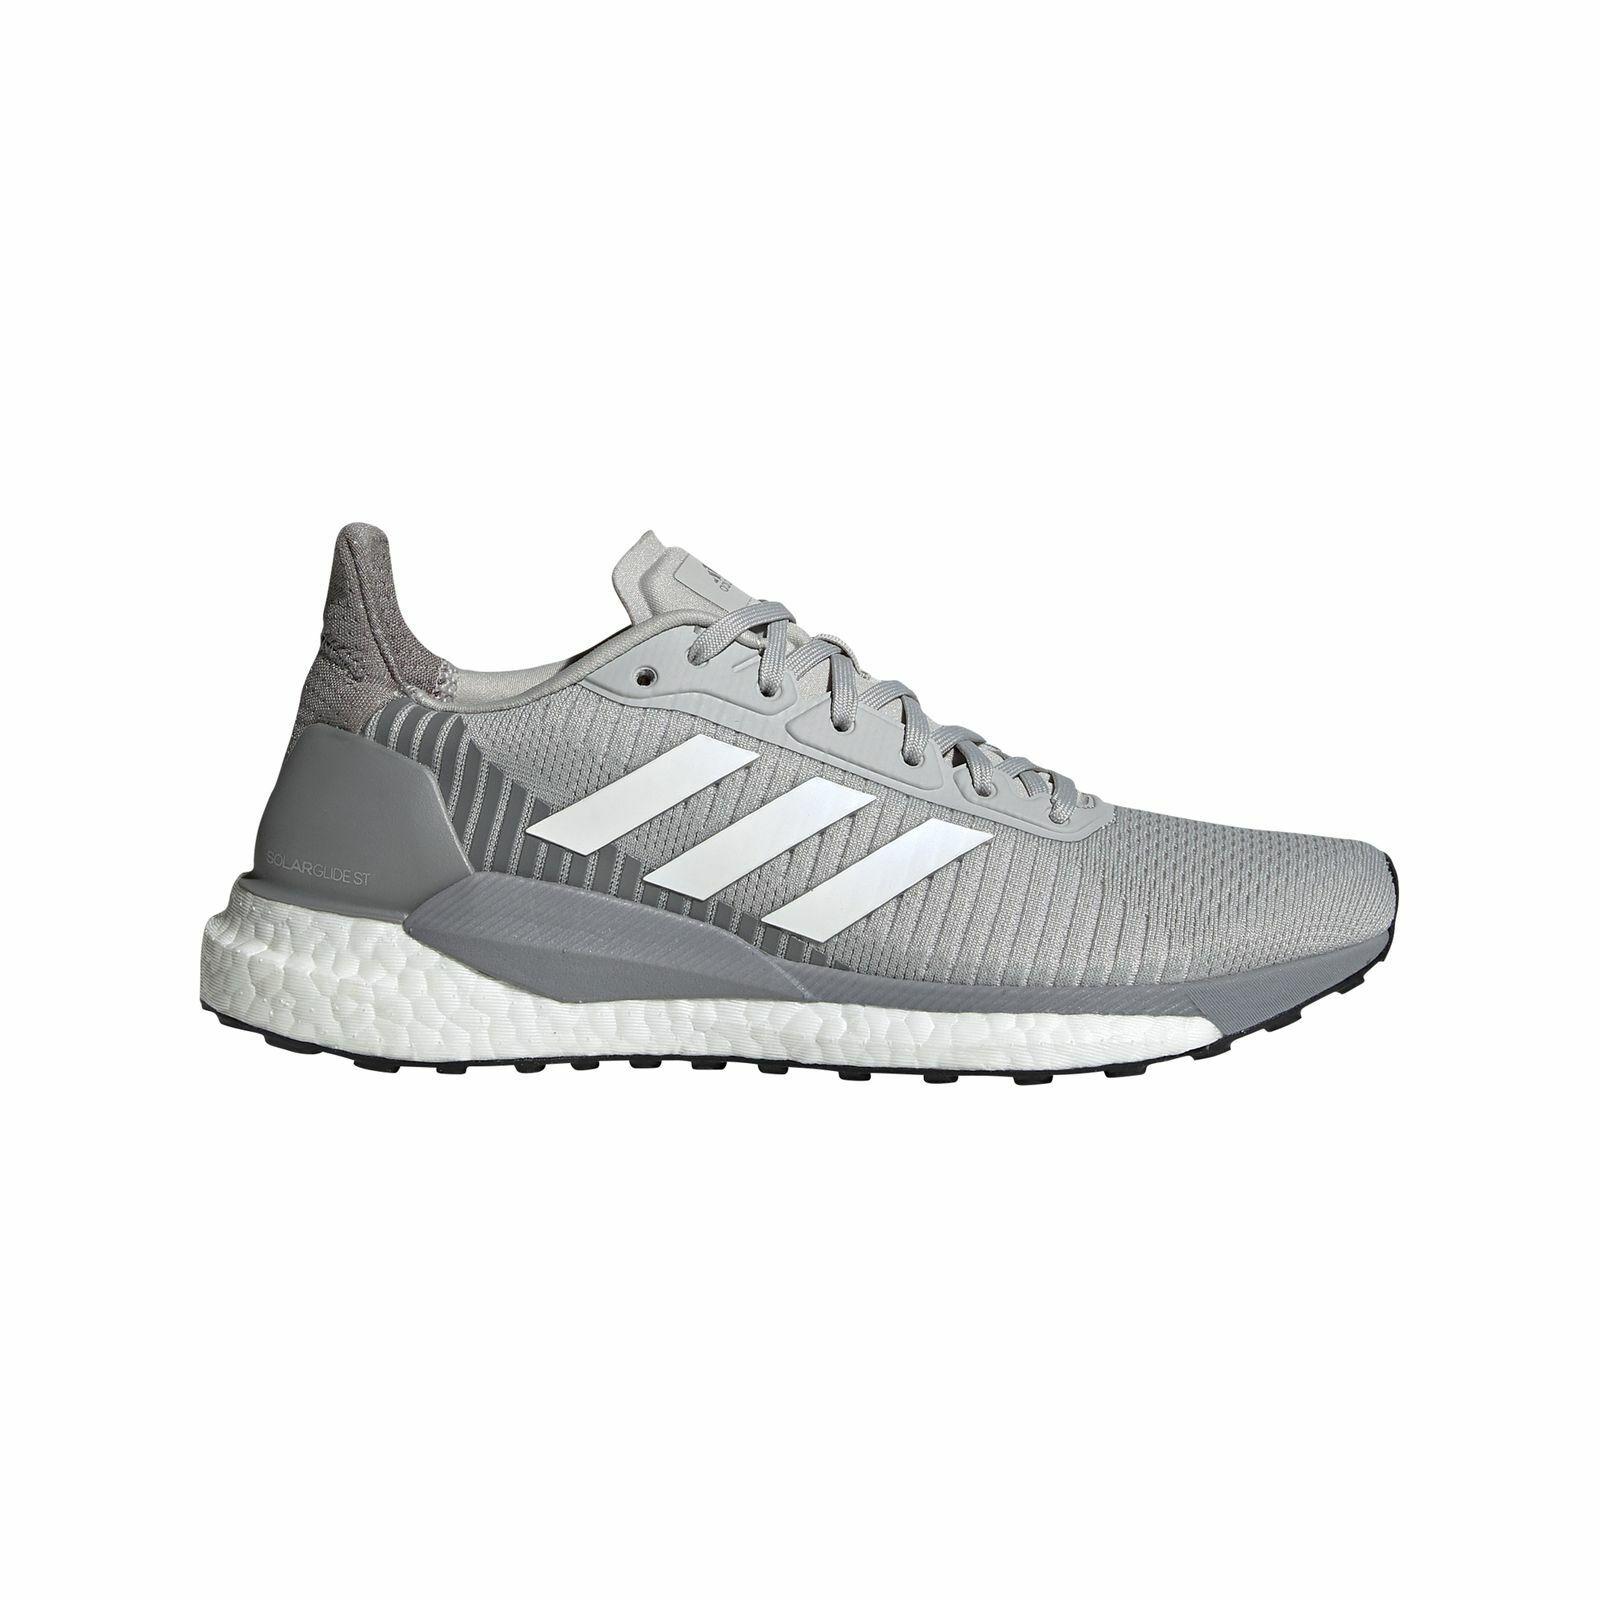 Adidas Performance Womens Leisure Running shoes Solar Glide 19 ST W Grey F34084